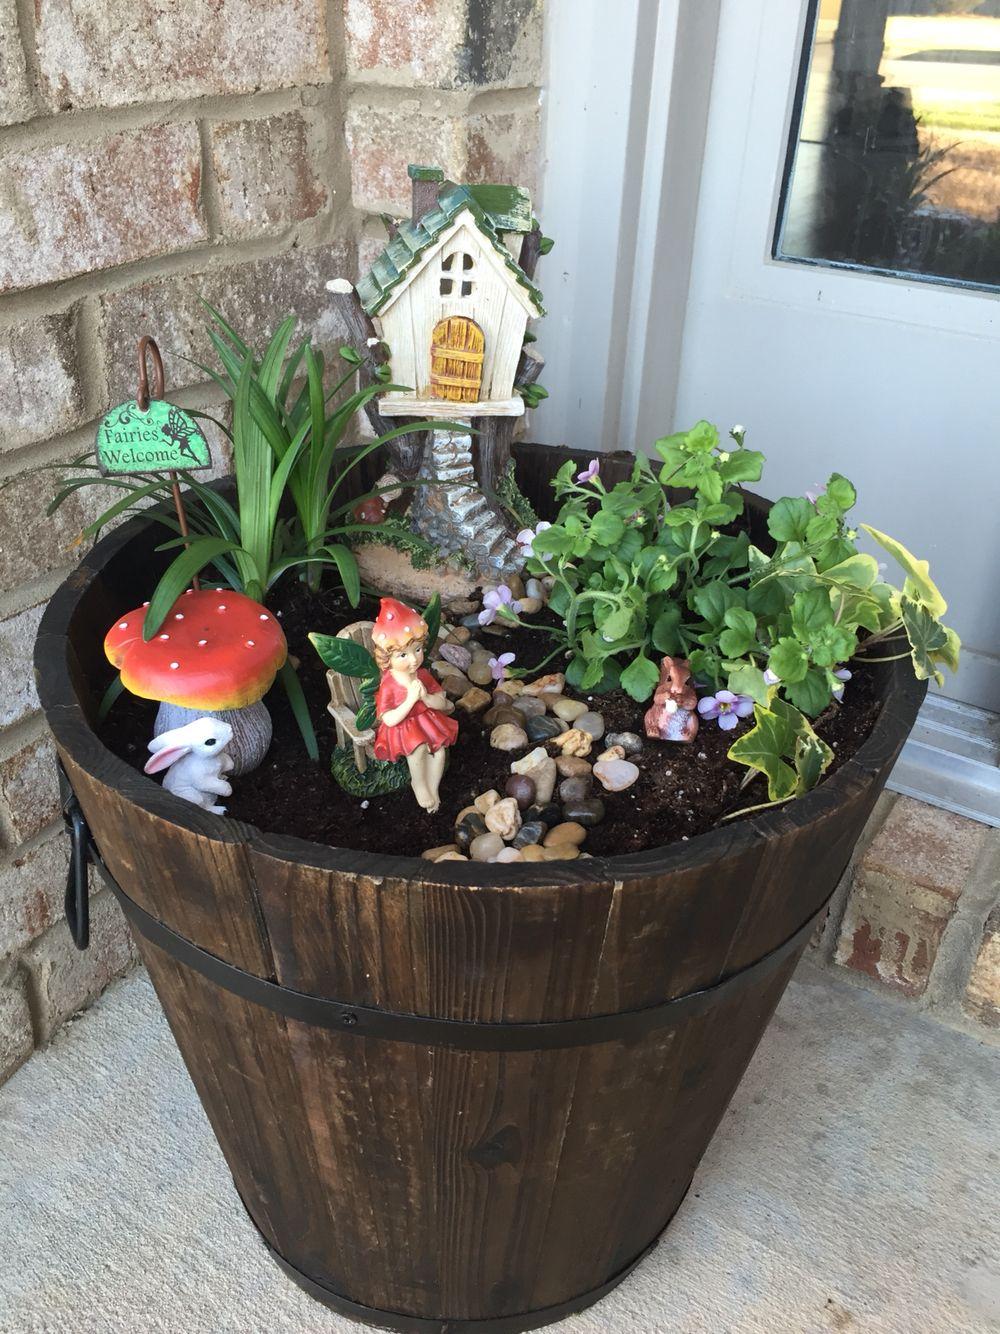 Fairy Garden Bucket from Home Depot. Fairy figures from